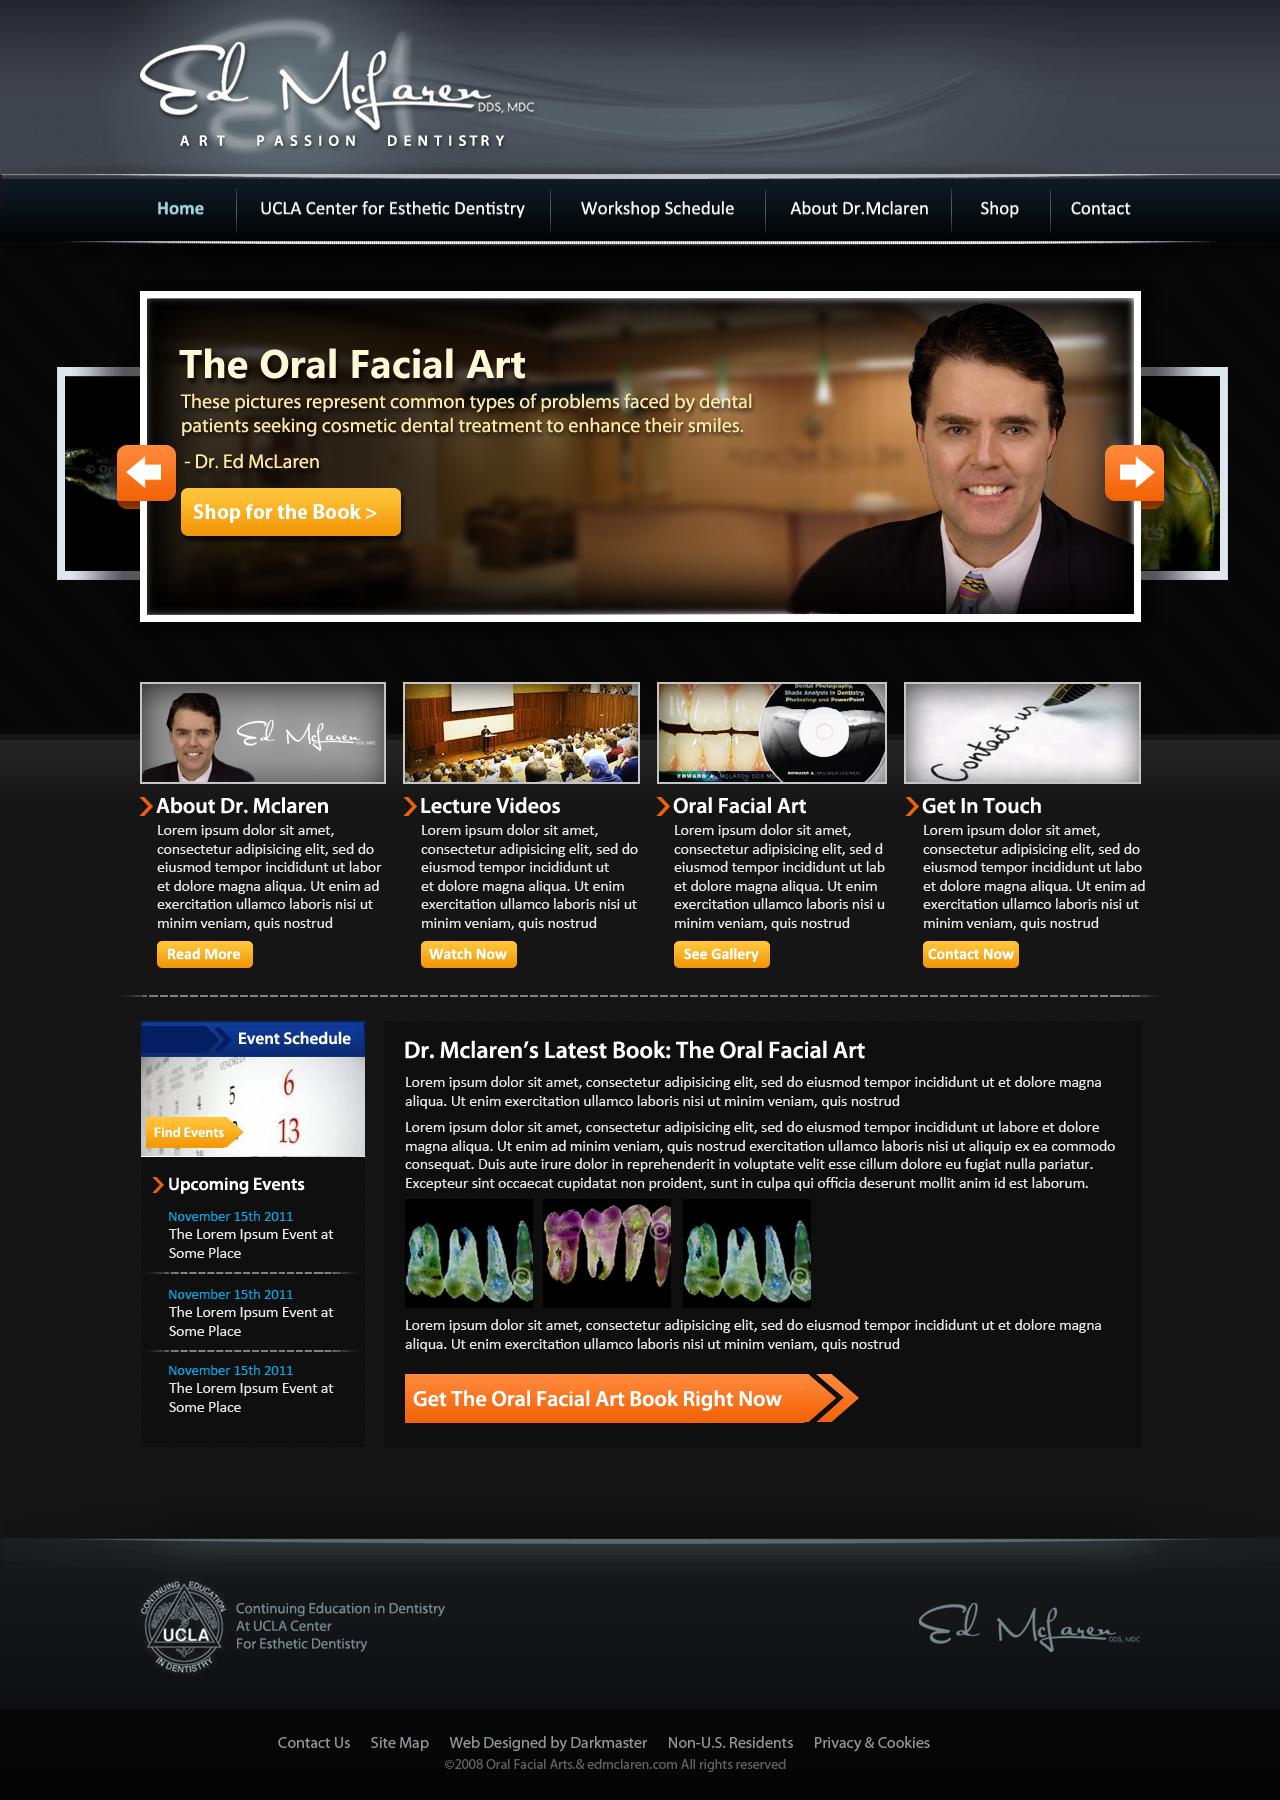 Create the next Website for Dr. Ed McLaren